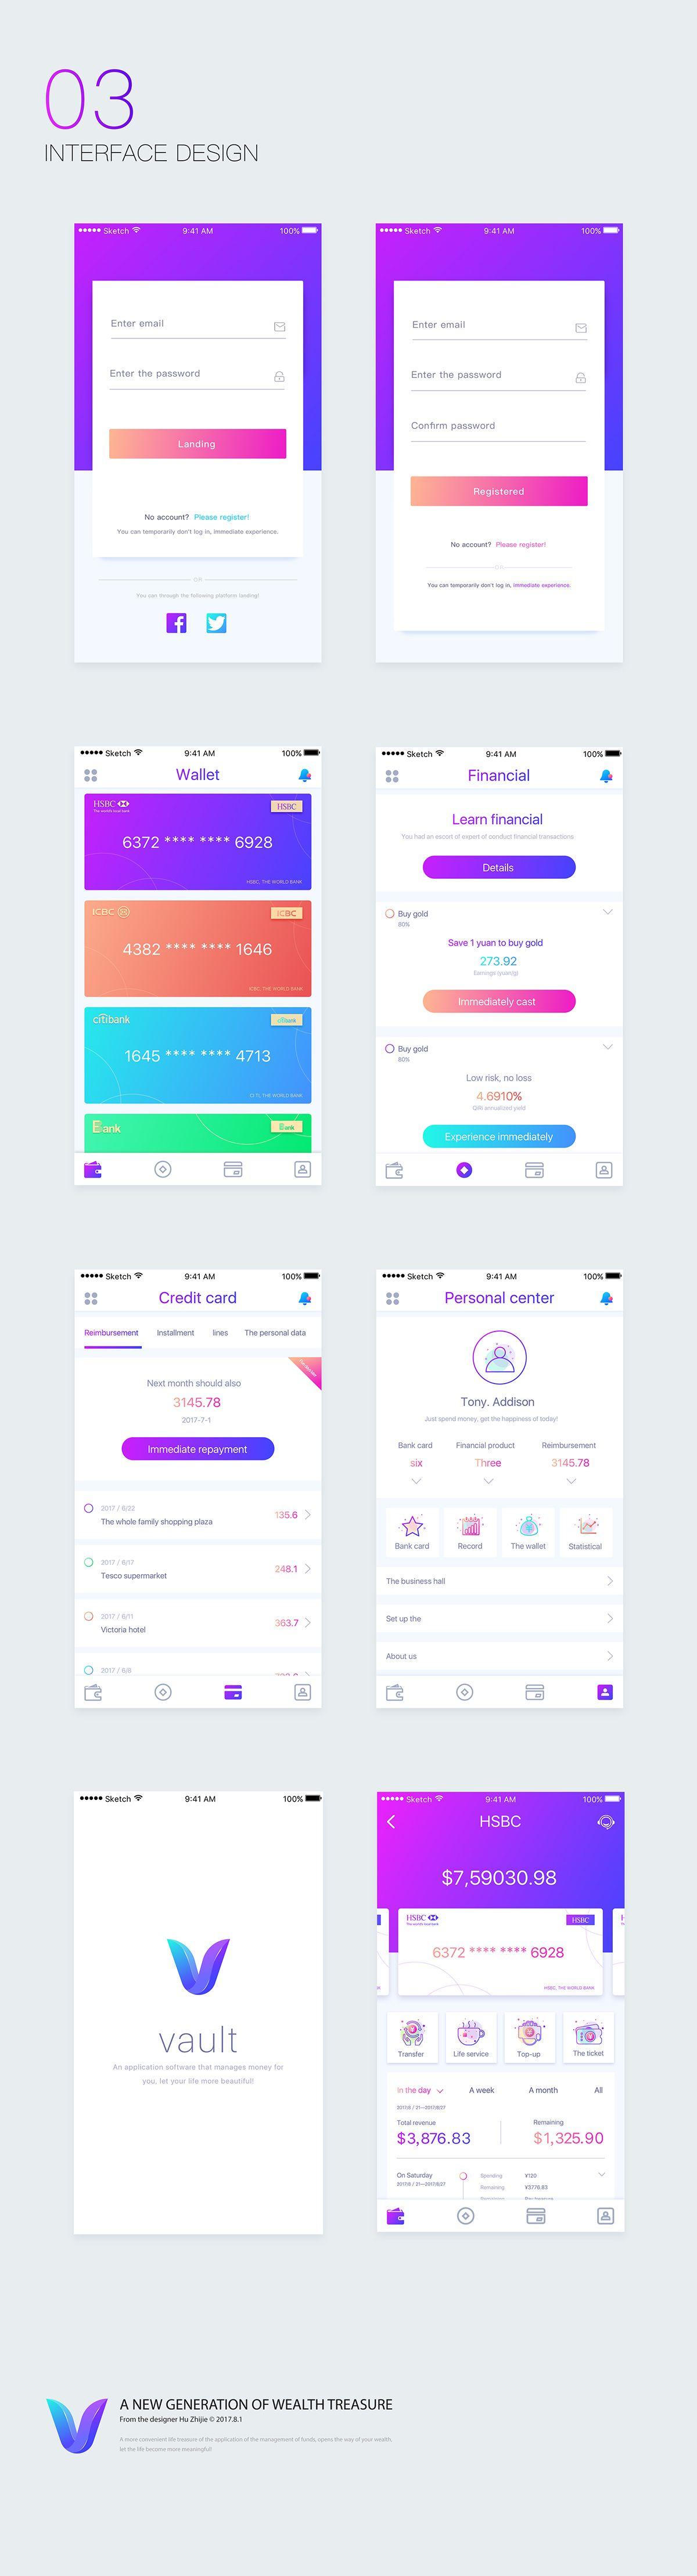 Vault financial app design on Behance App design, Iphone